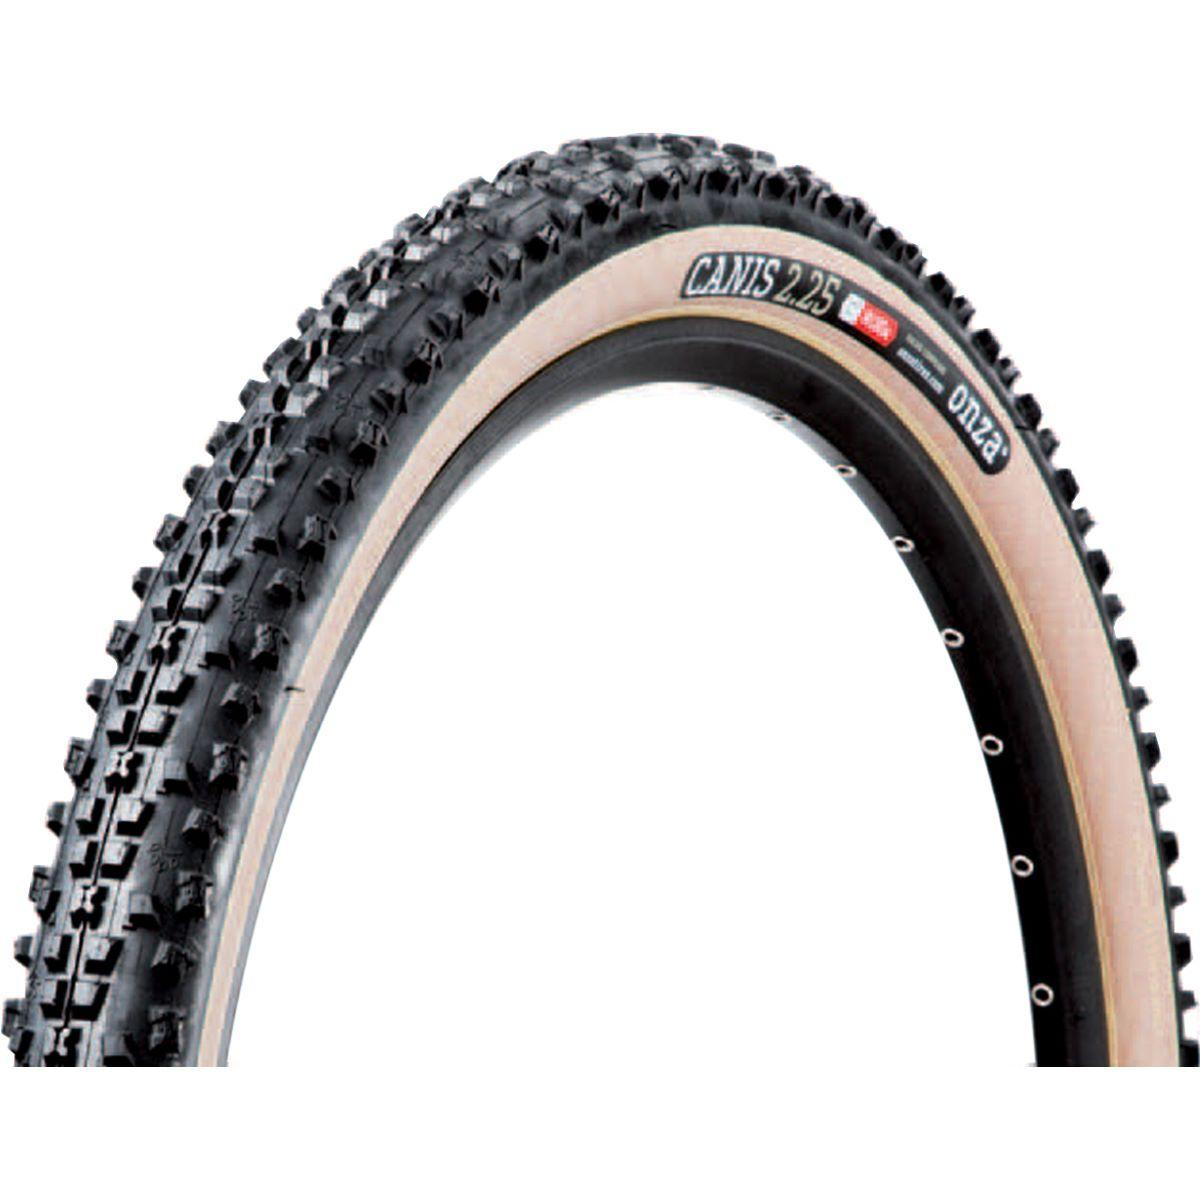 Wiggle Com Onza Canis Skinwall 26 Folding Mtb Tire Mtb Off Road Tires